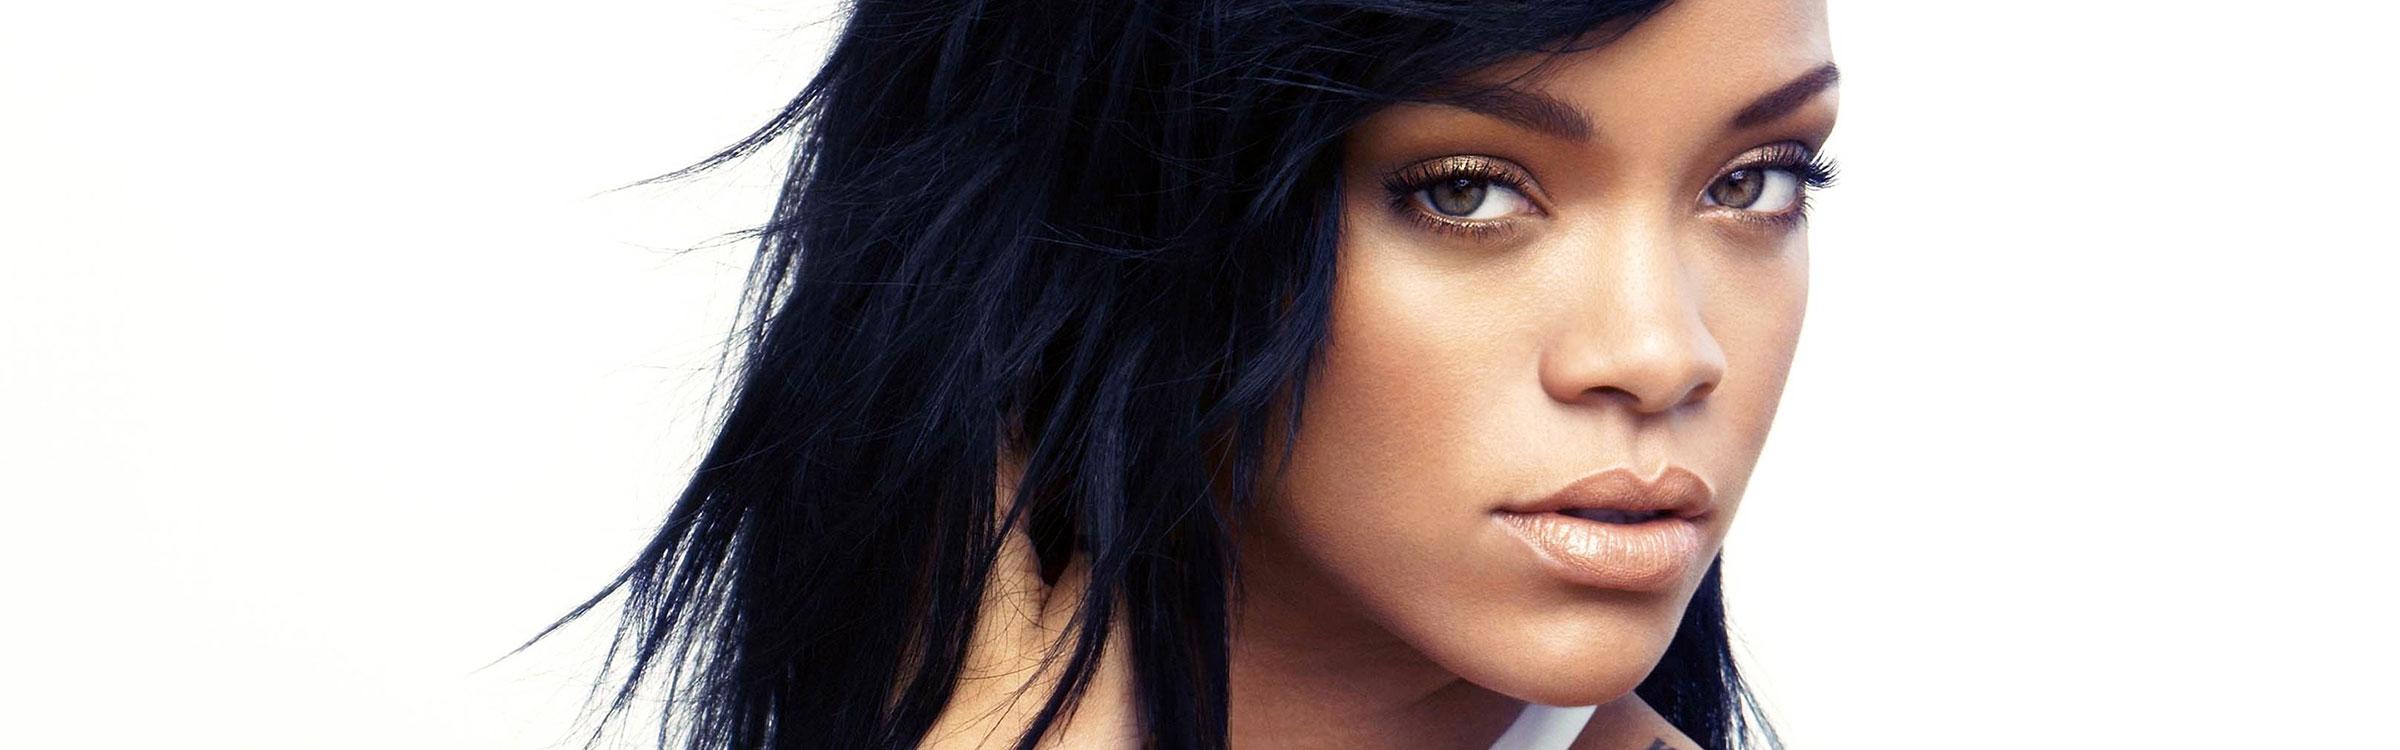 Rihanna 2014 wide